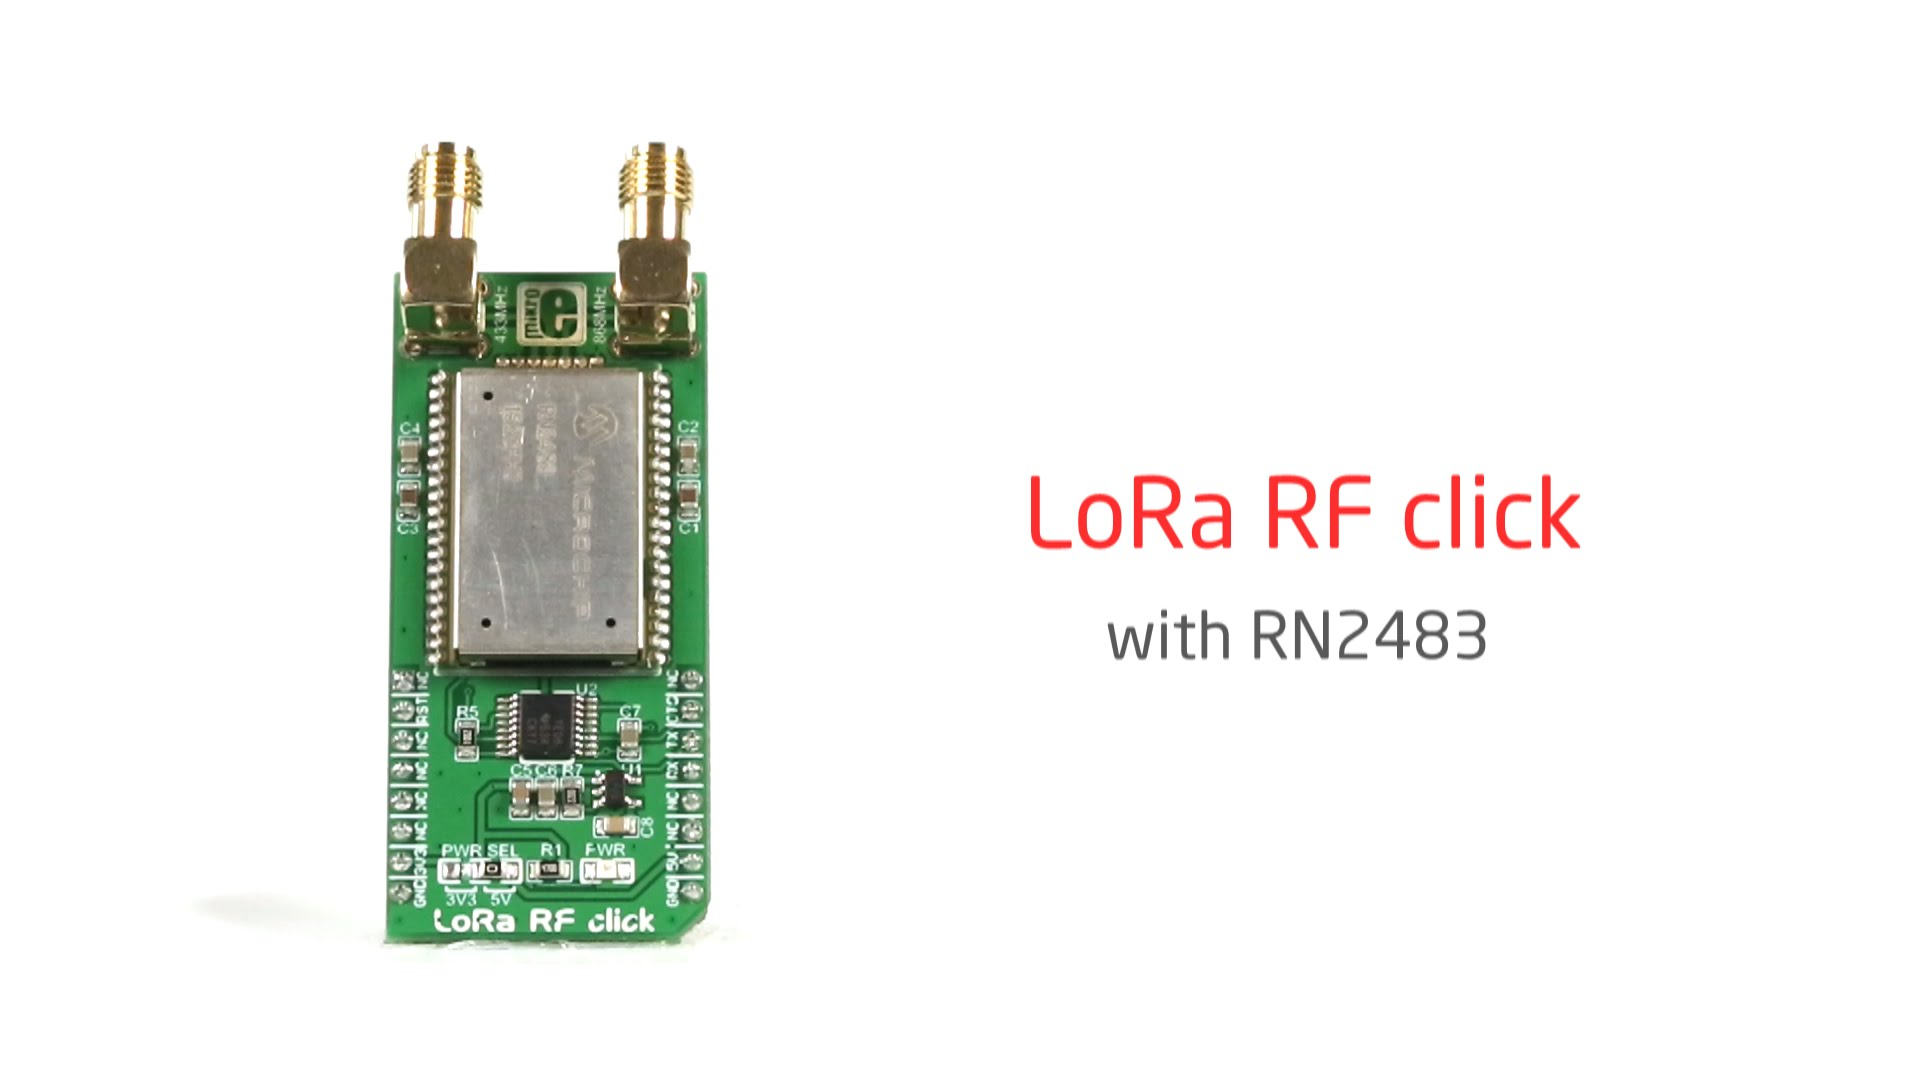 LoRa RF click released